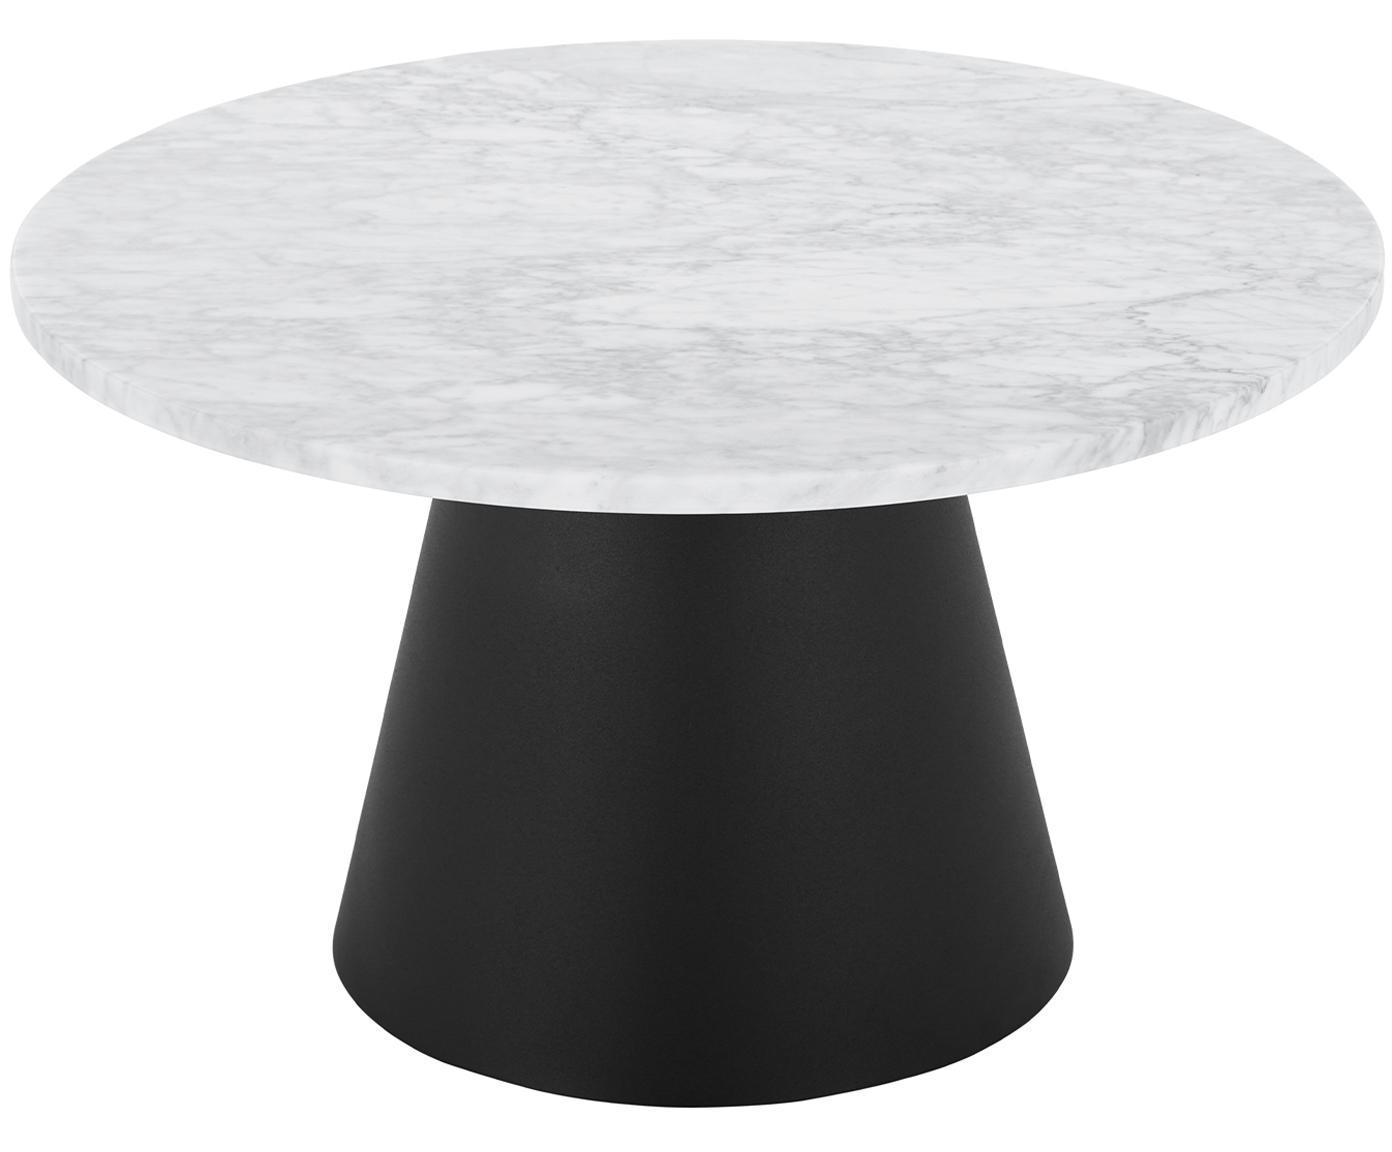 Ronde marmeren salontafel Mary, Tafelblad: Carrara marmer, Frame: gecoat metaal, Wit-grijs marmer, zwart, Ø 70 x H 40 cm